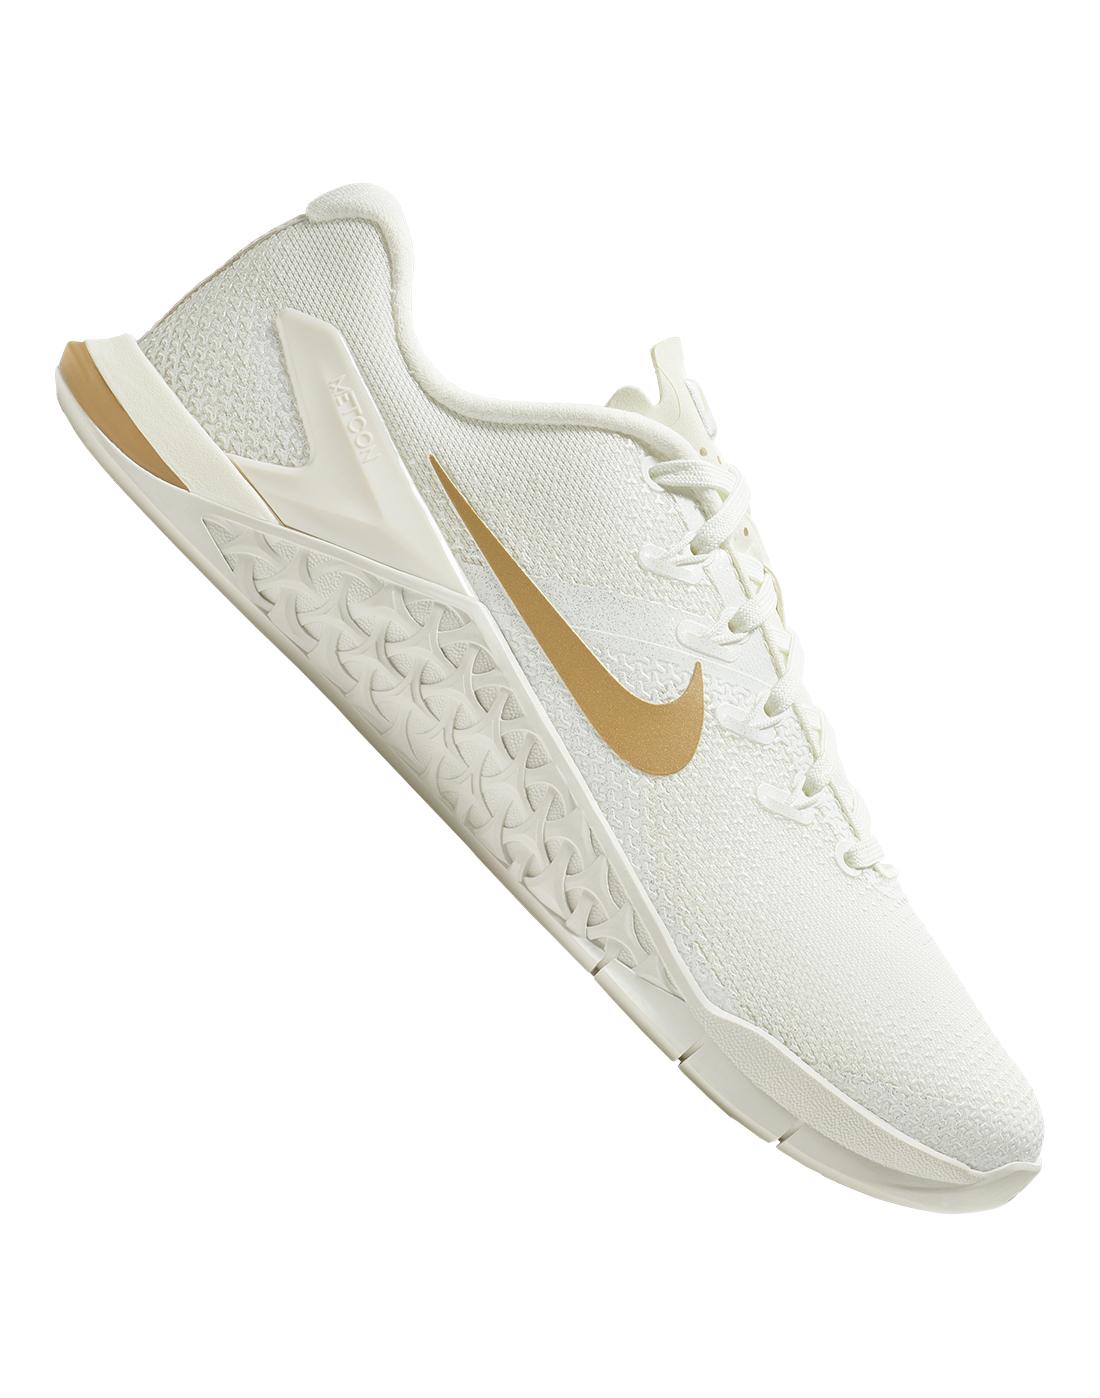 b25ae34775029 Women s White   Gold Nike Metcon Gym Shoes